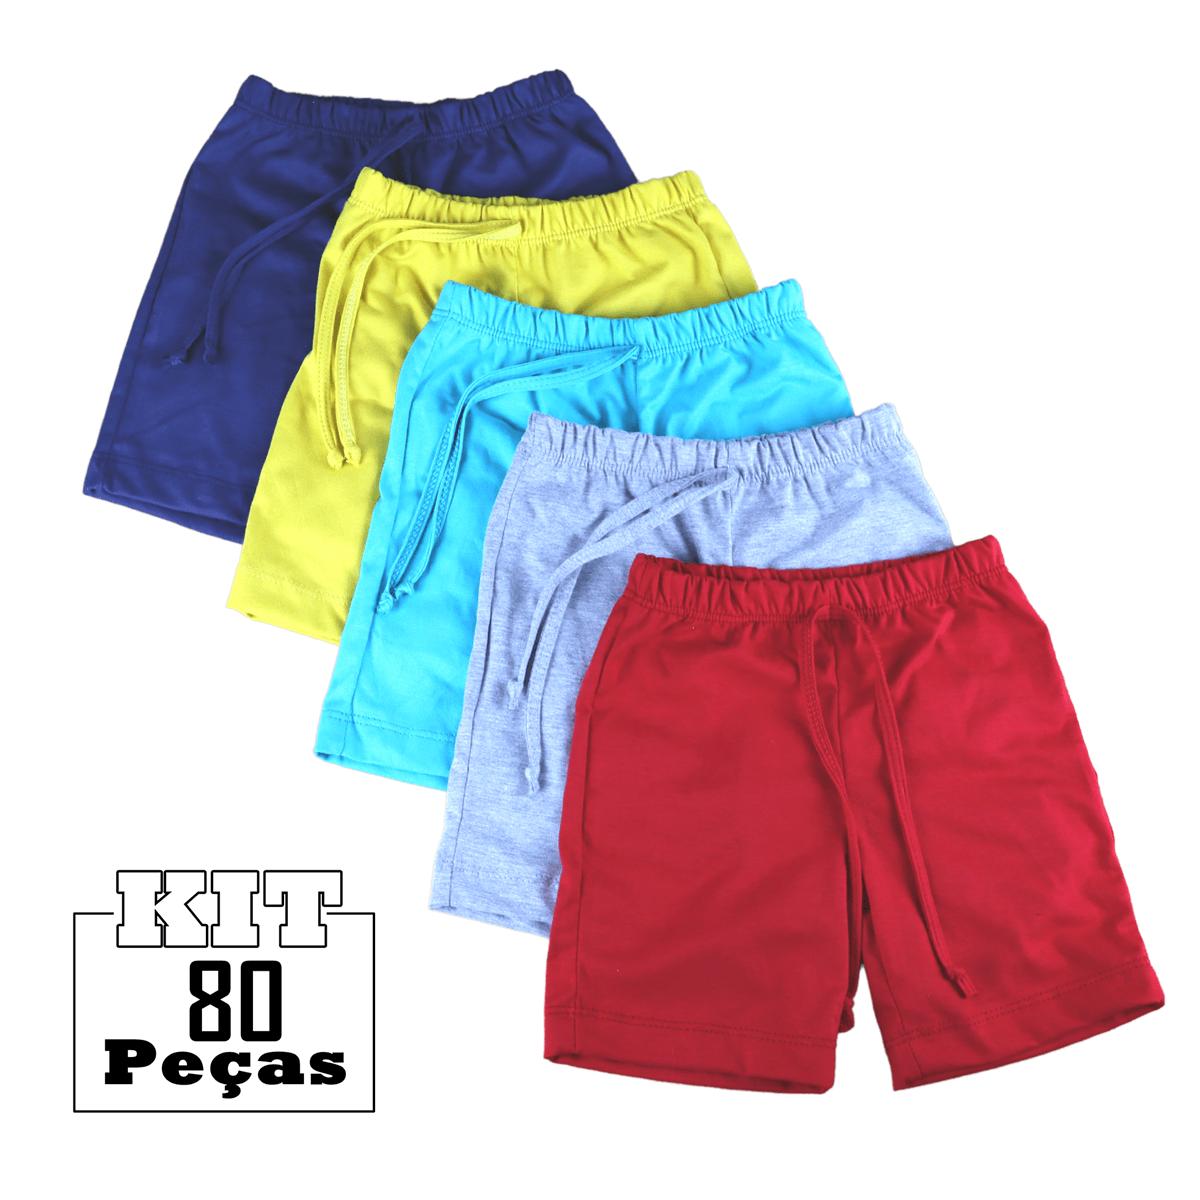 Kit 80 Shorts Bermuda Malha Bebê Menina Menino Atacado